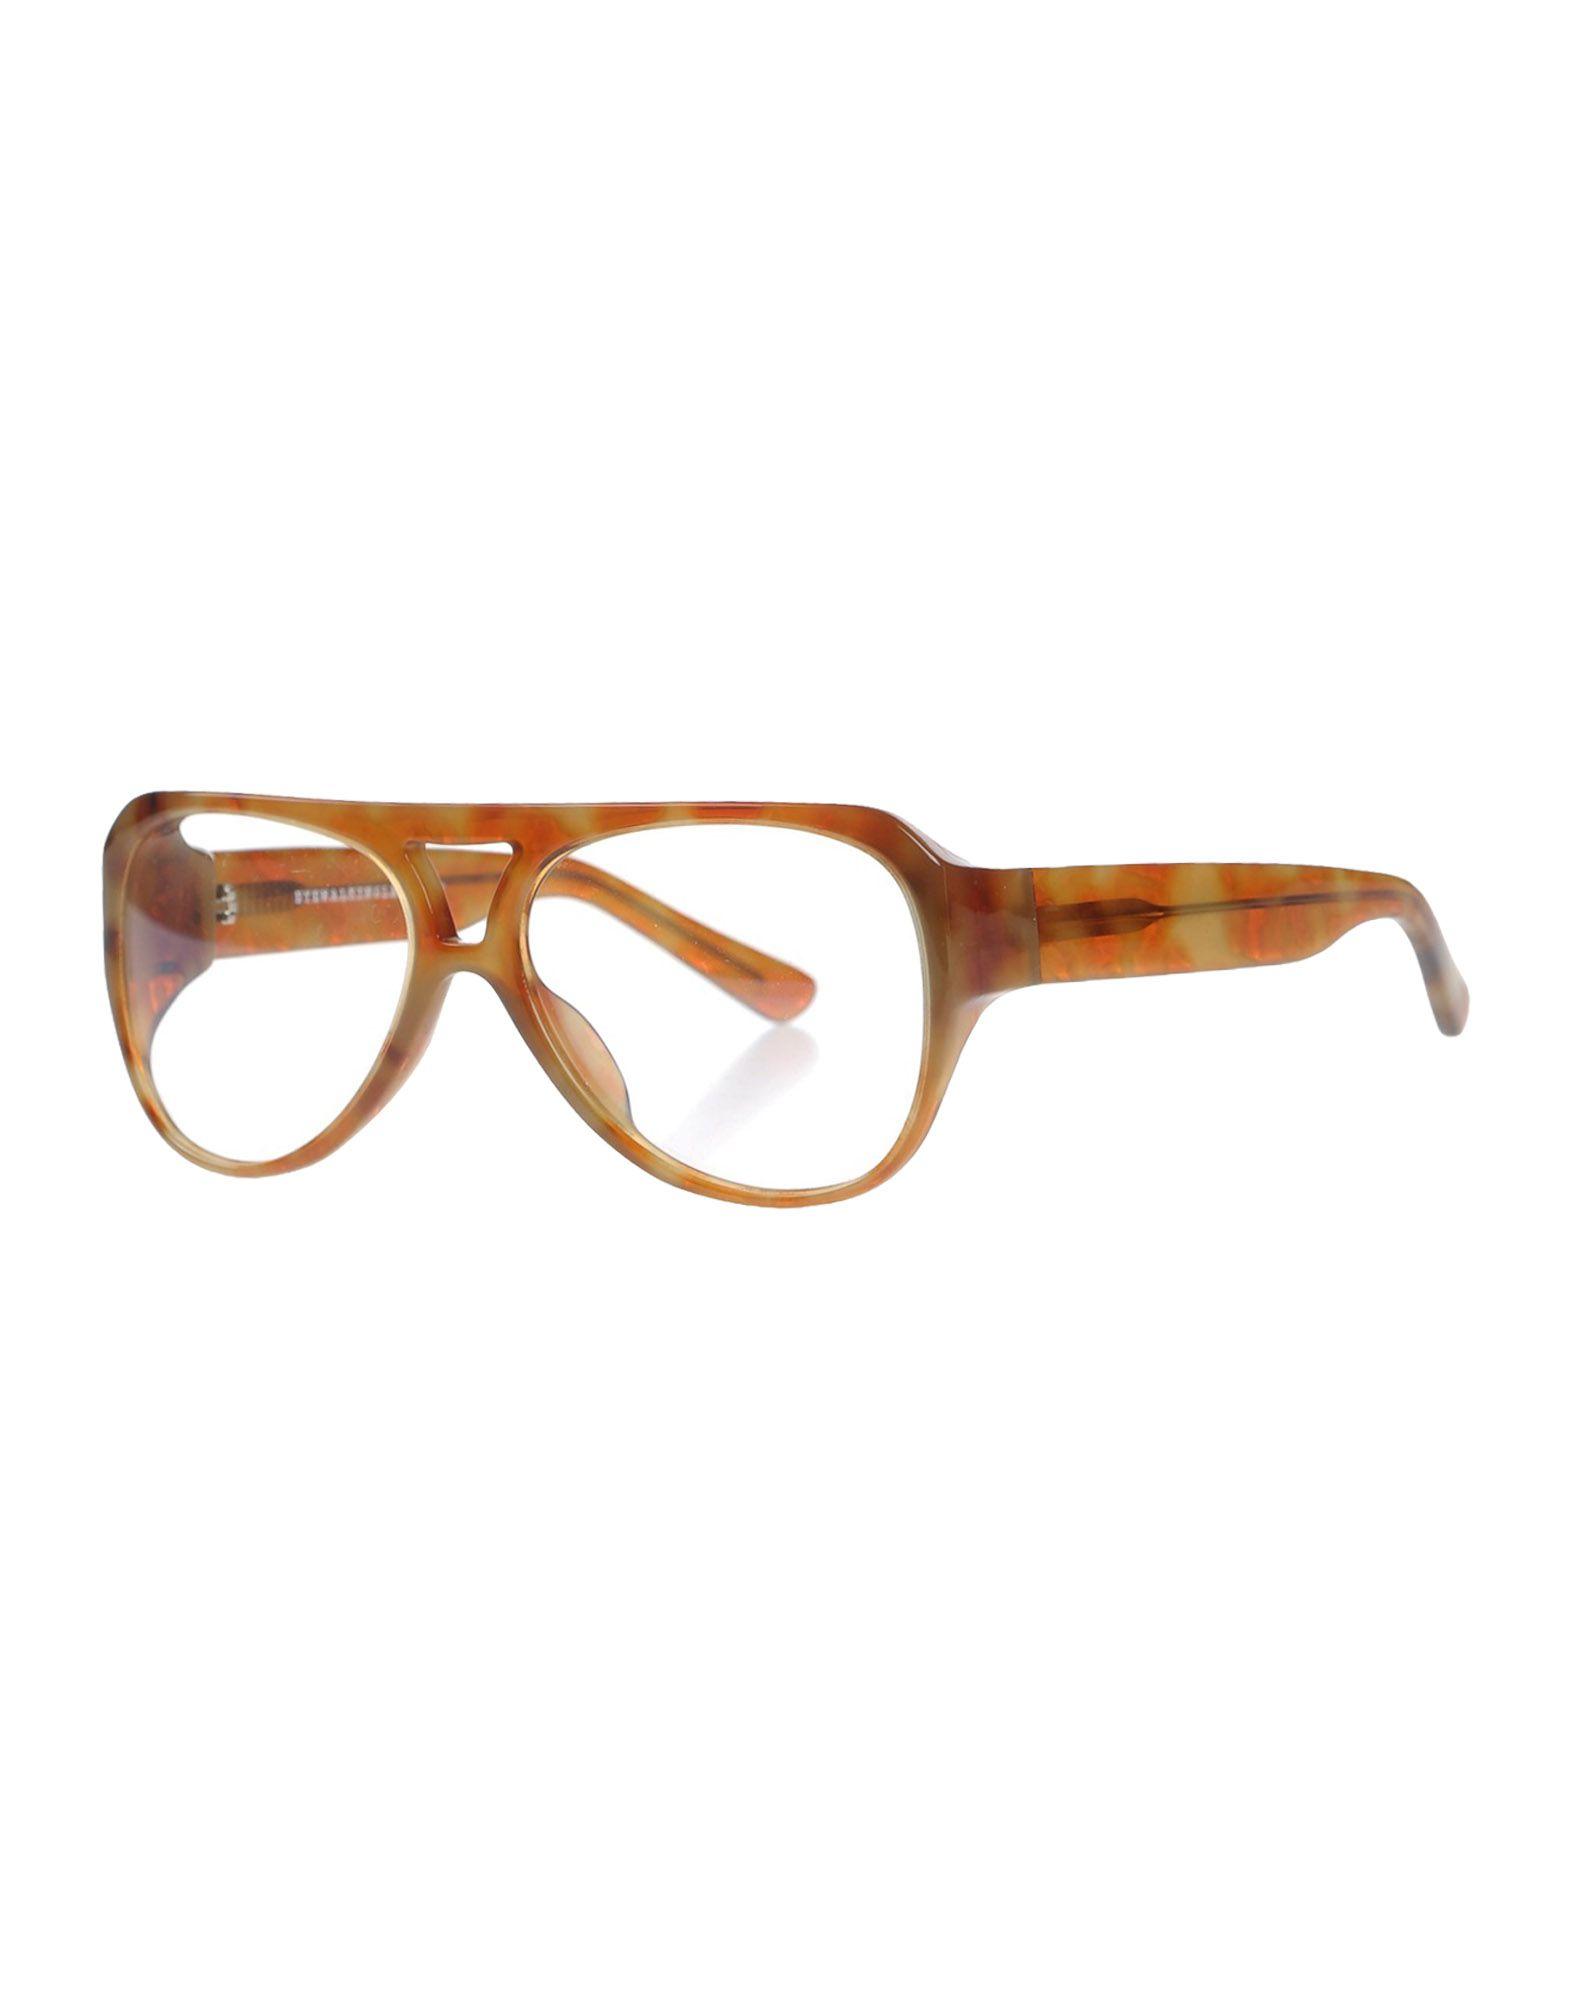 EYEWALKINGLASSES Herren Brille Farbe Kamel Größe 1